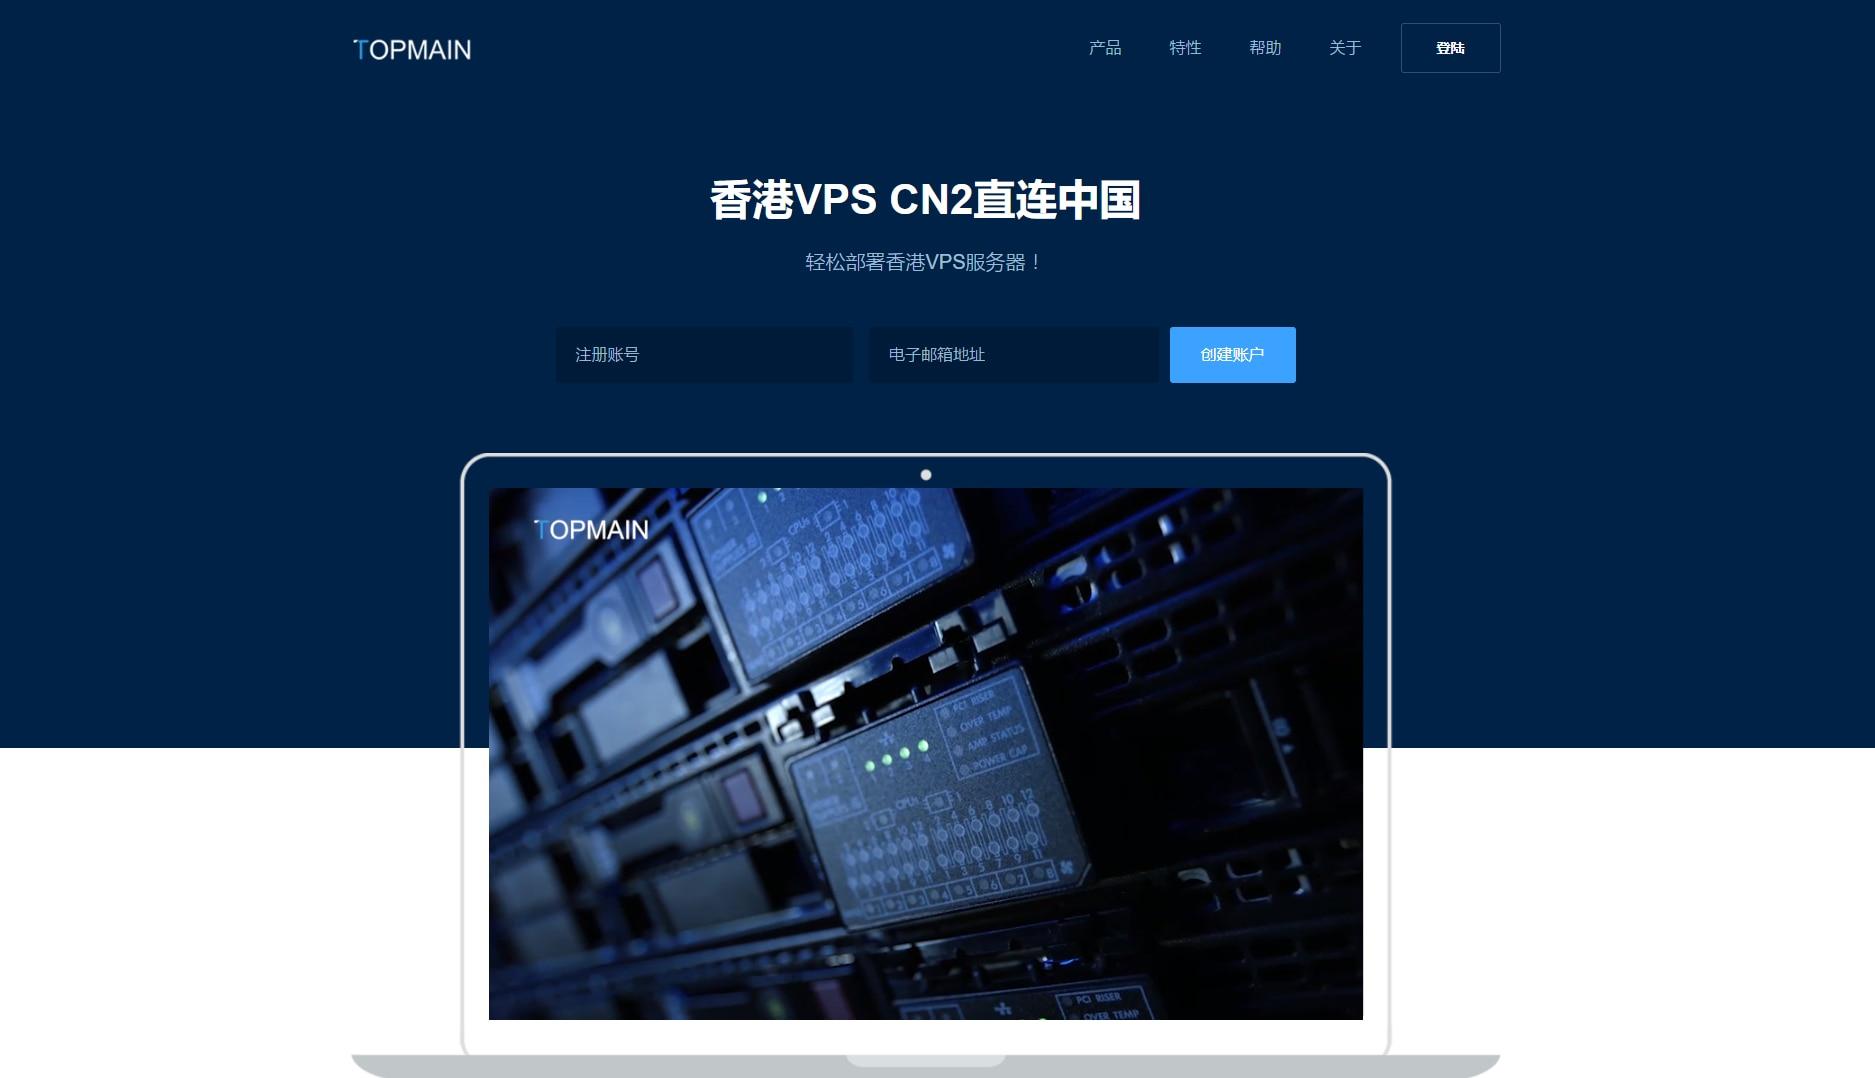 Topmain : 香港 HKBN 纯固态 SSD VPS,元旦促销仅20元